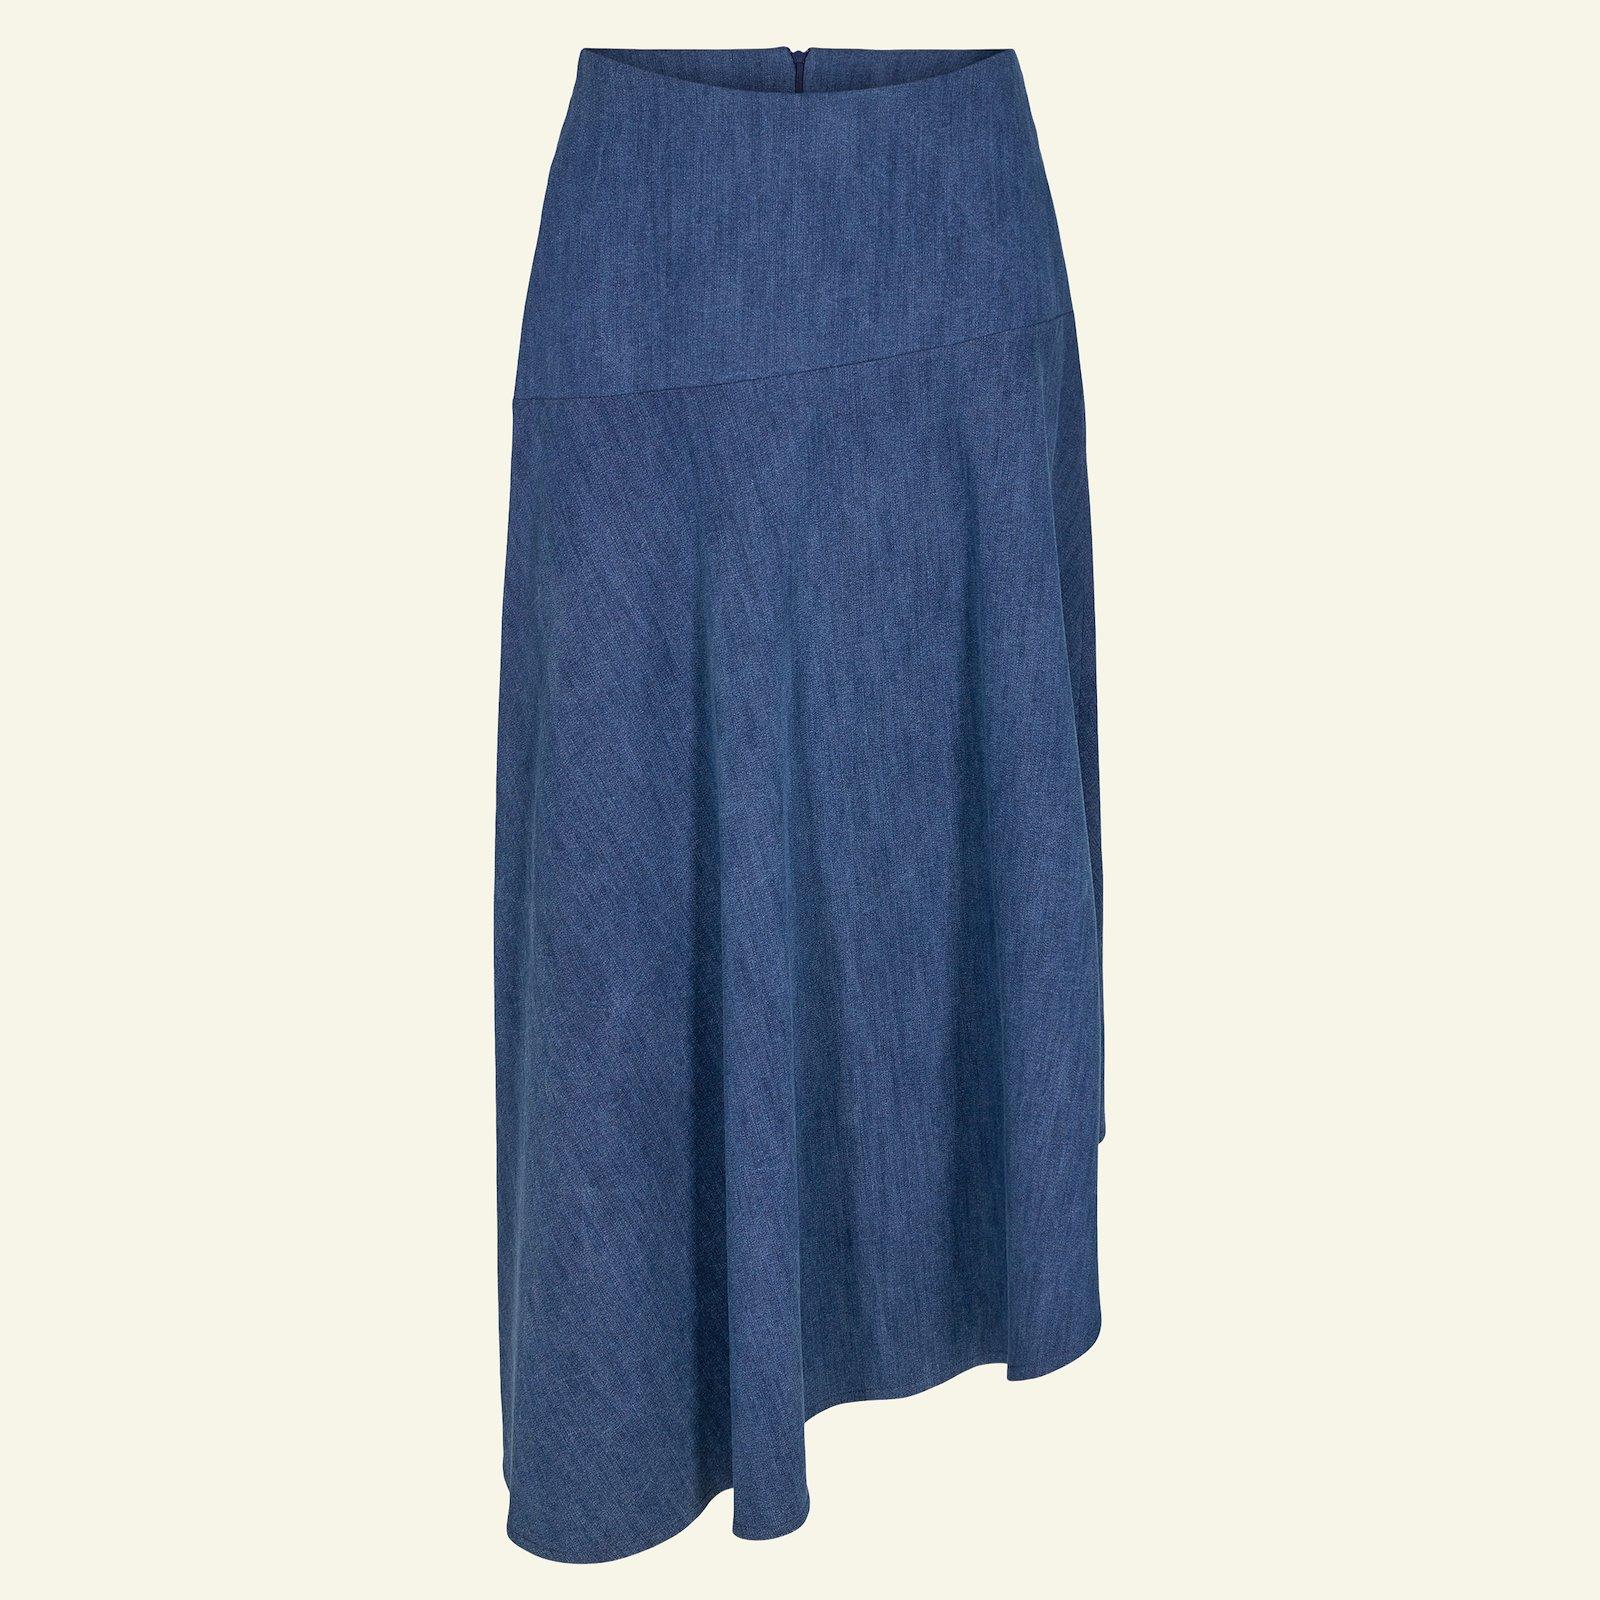 Asymmetric skirt, 42/14 p21041_460851_sskit